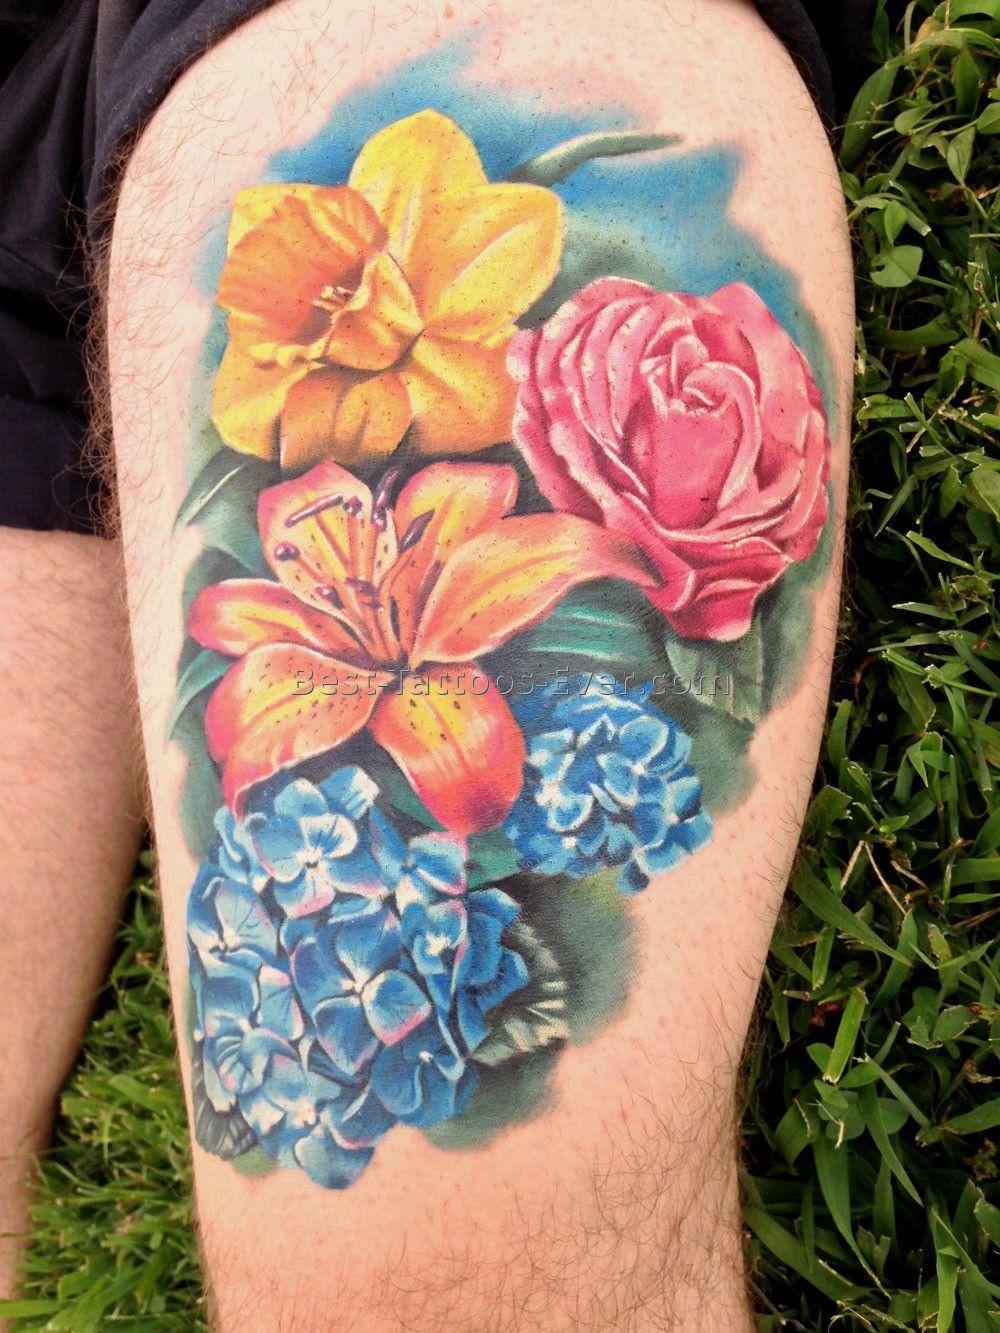 narcissus flower tattoo 10 | Best Tattoos Ever | Tatoos ...